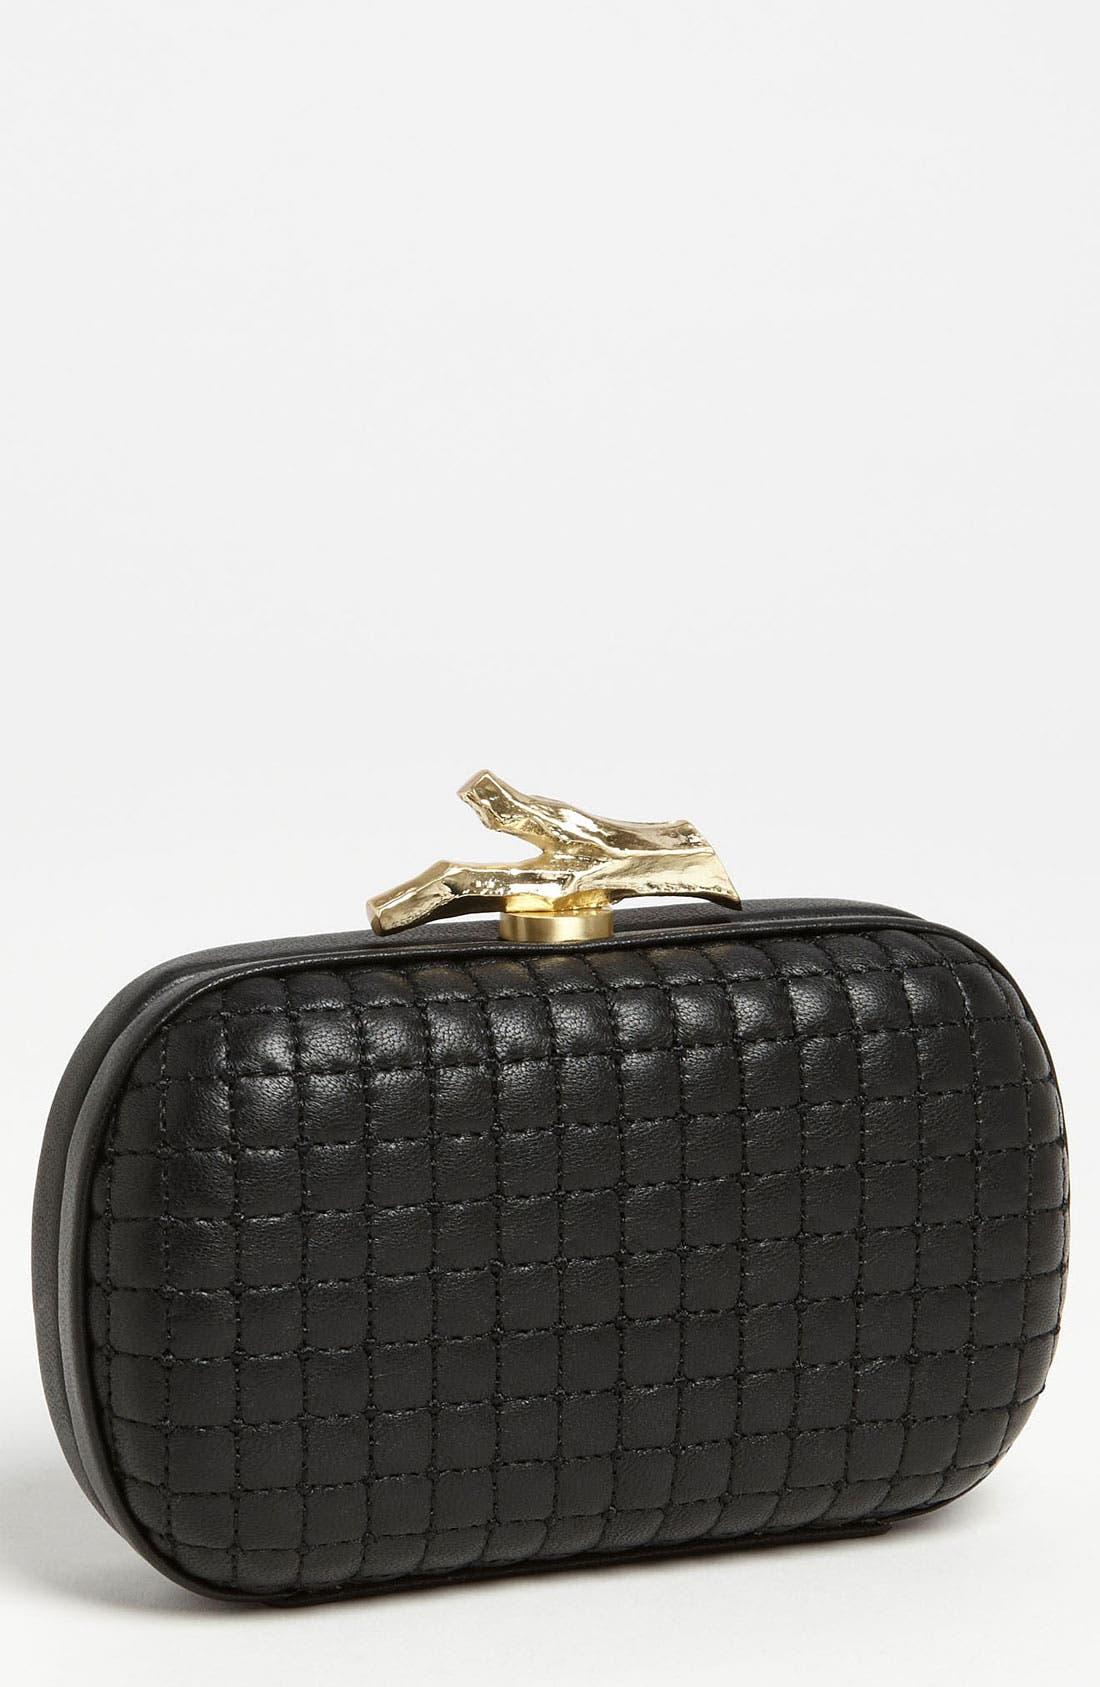 Alternate Image 1 Selected - Diane von Furstenberg 'Lytton' Quilted Leather Clutch